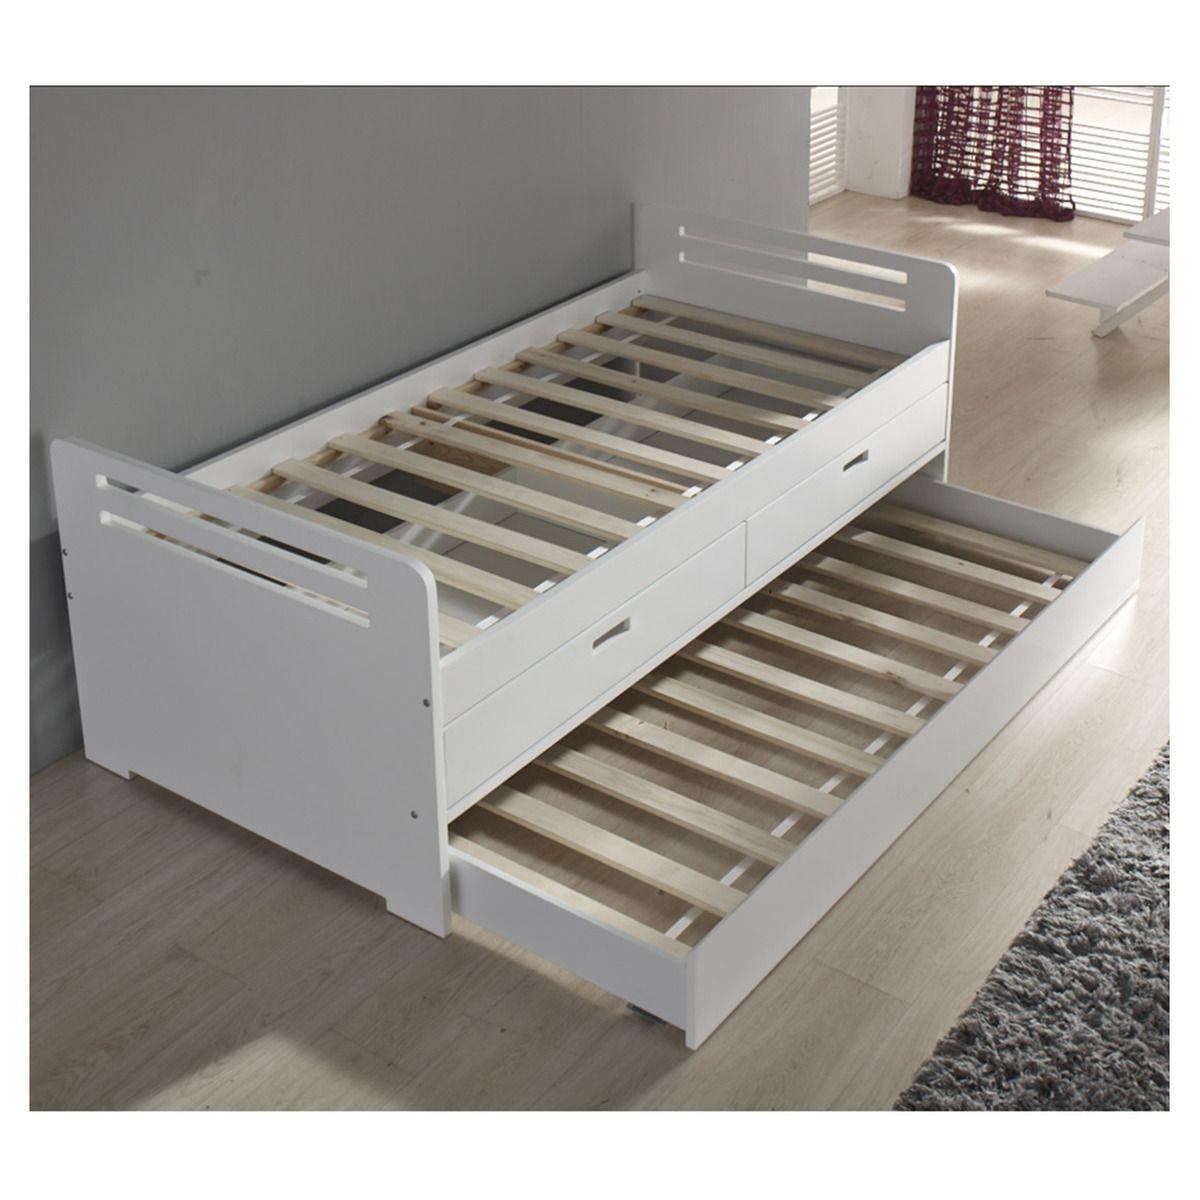 Cama nido el corte ingl s luna ni os pinterest camas for Pegatinas infantiles para muebles